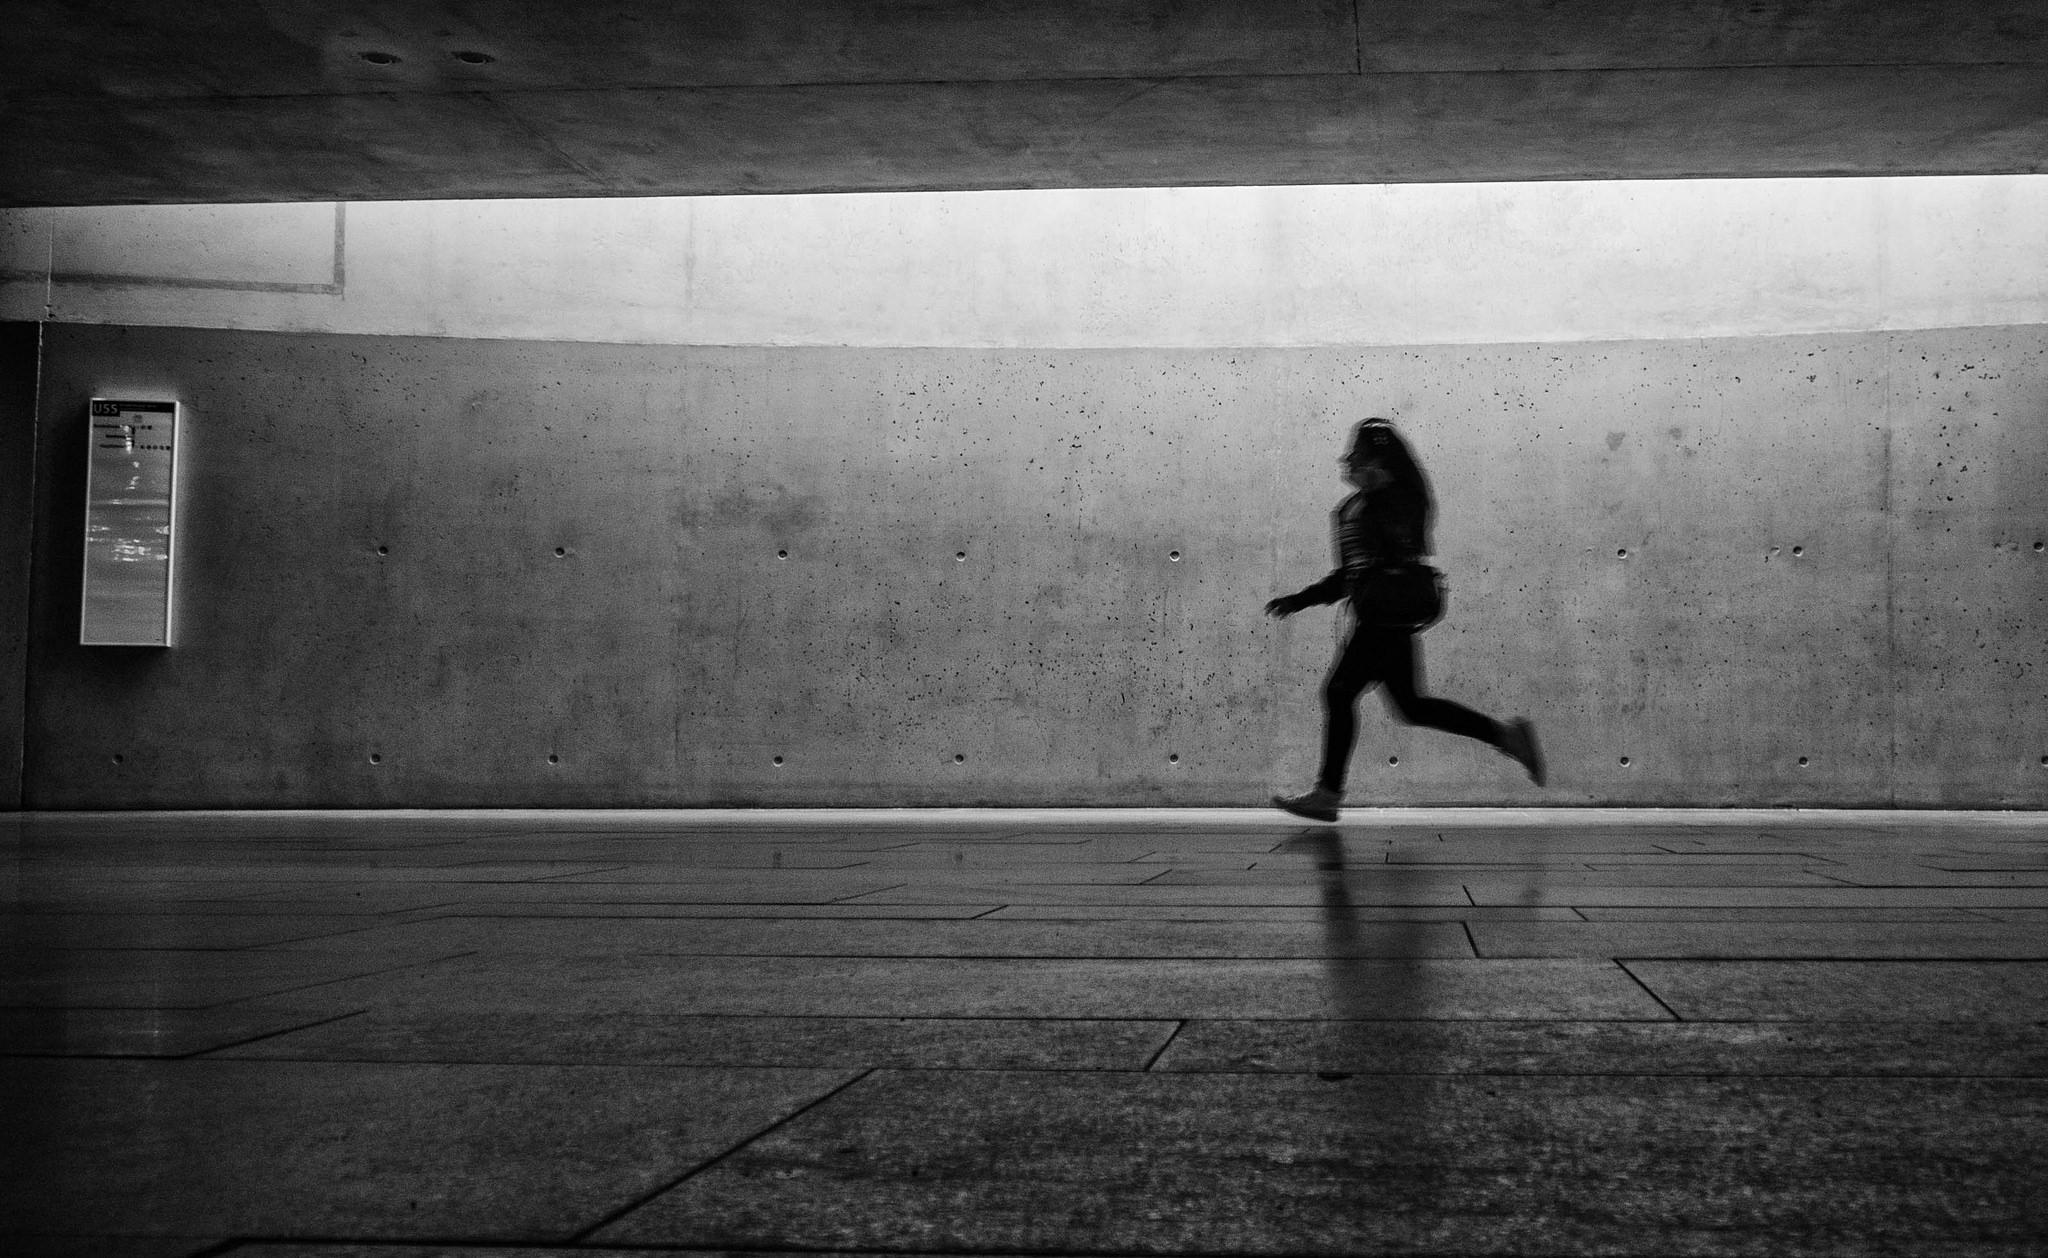 Hurry  by Georgie Pauwels